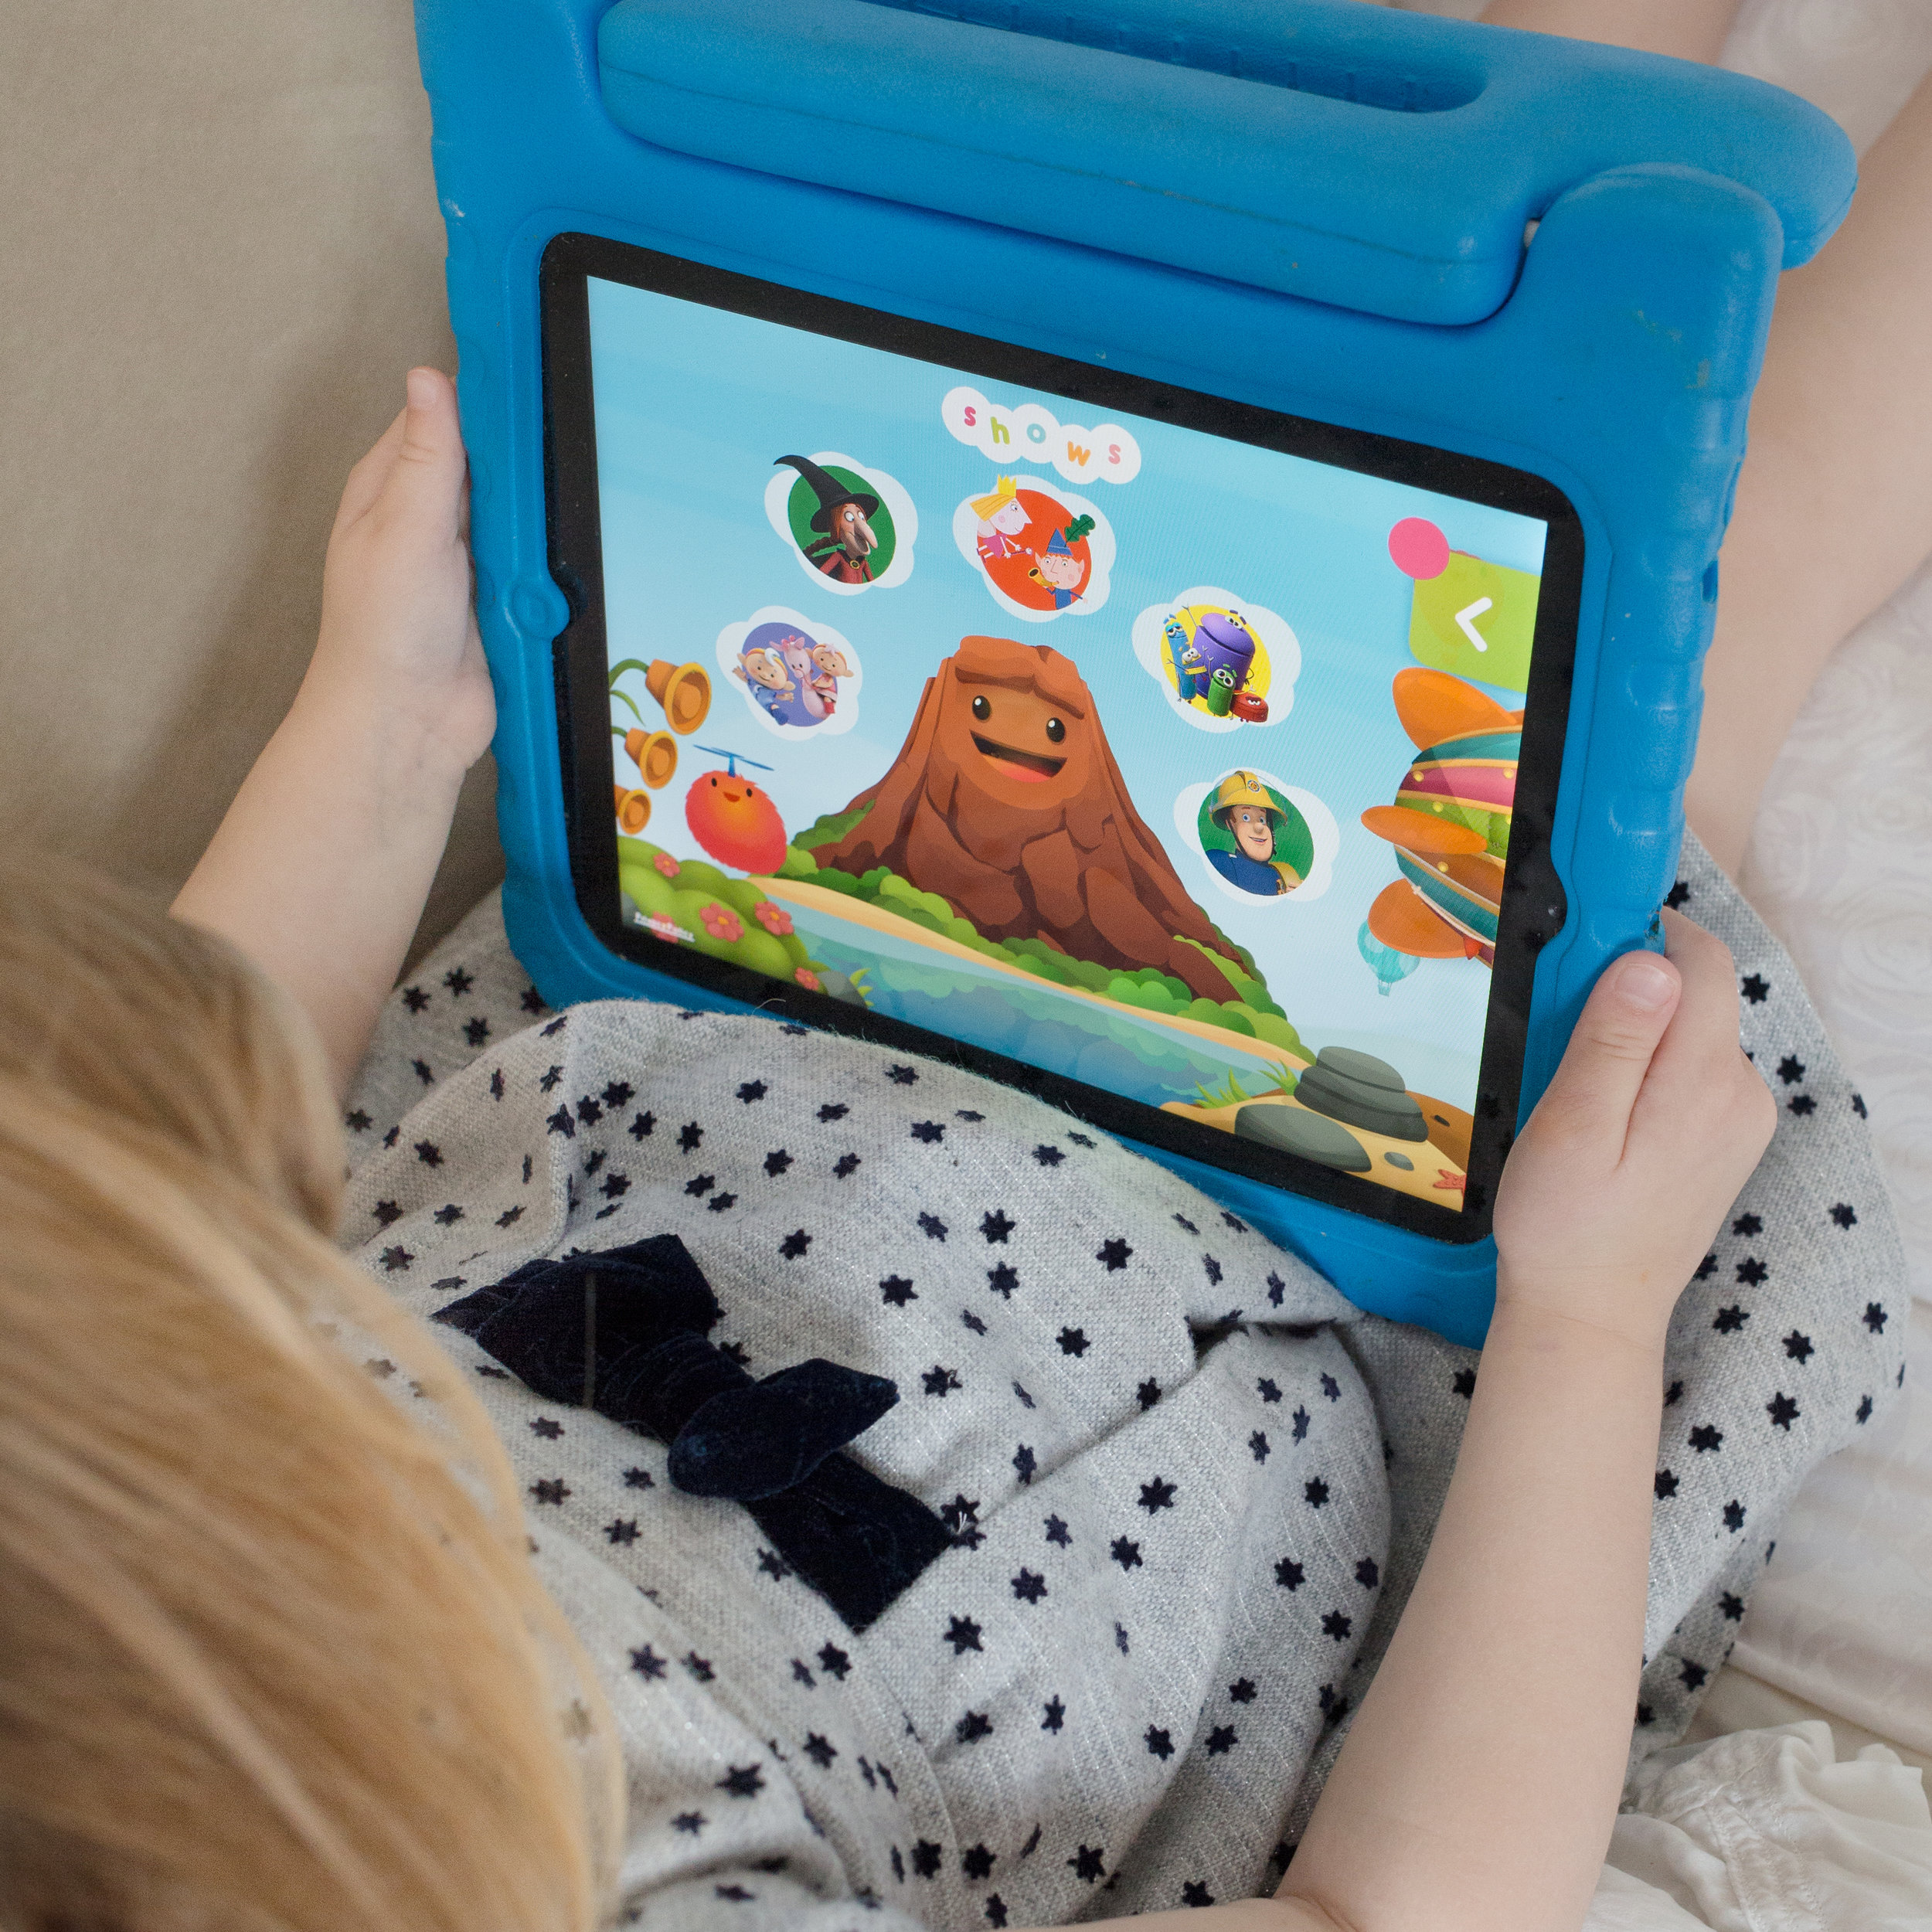 9. Hopster Kids TV App